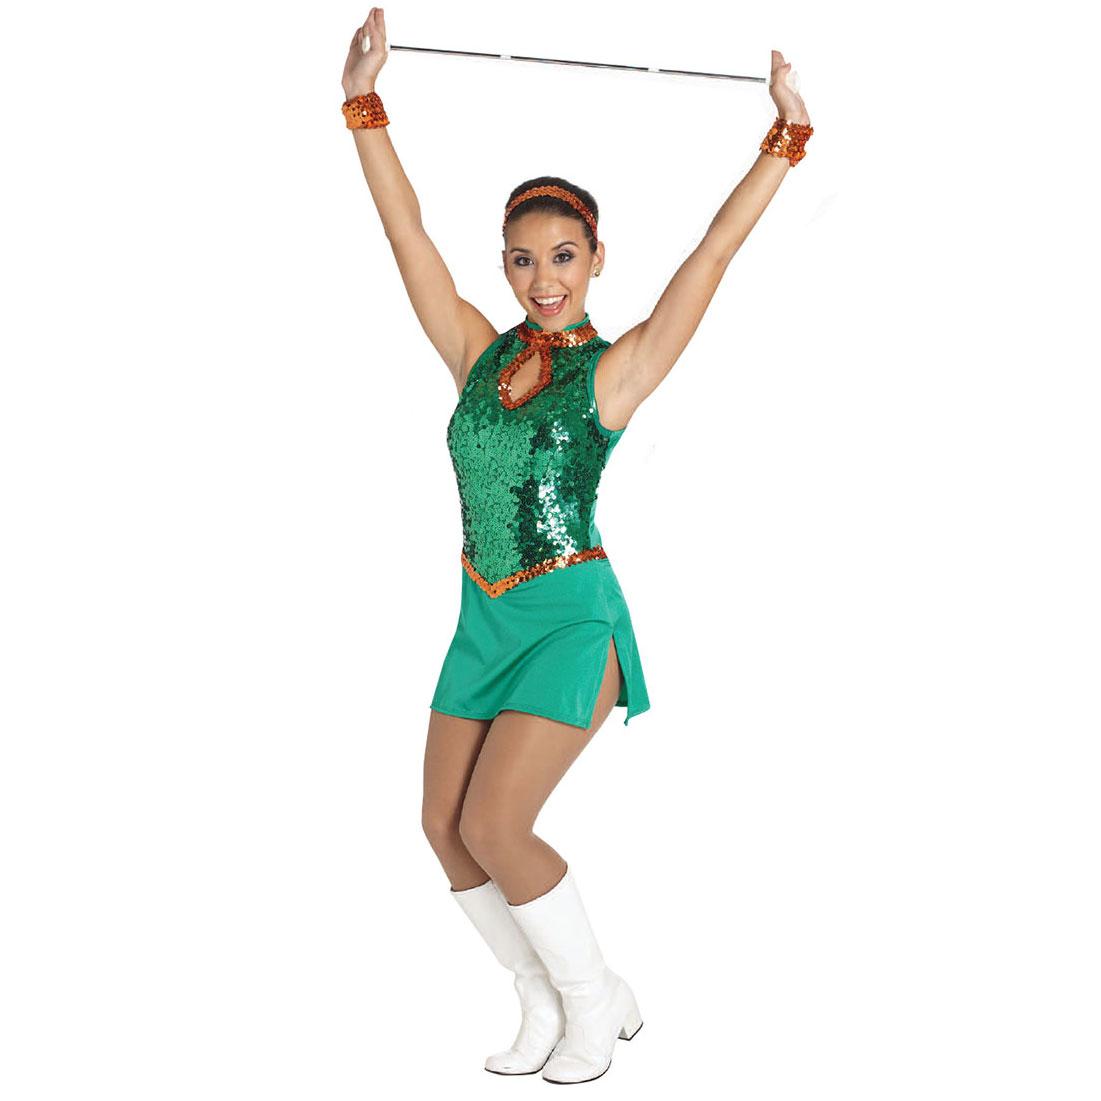 Guard Uniforms: Fascination Tunic Dress